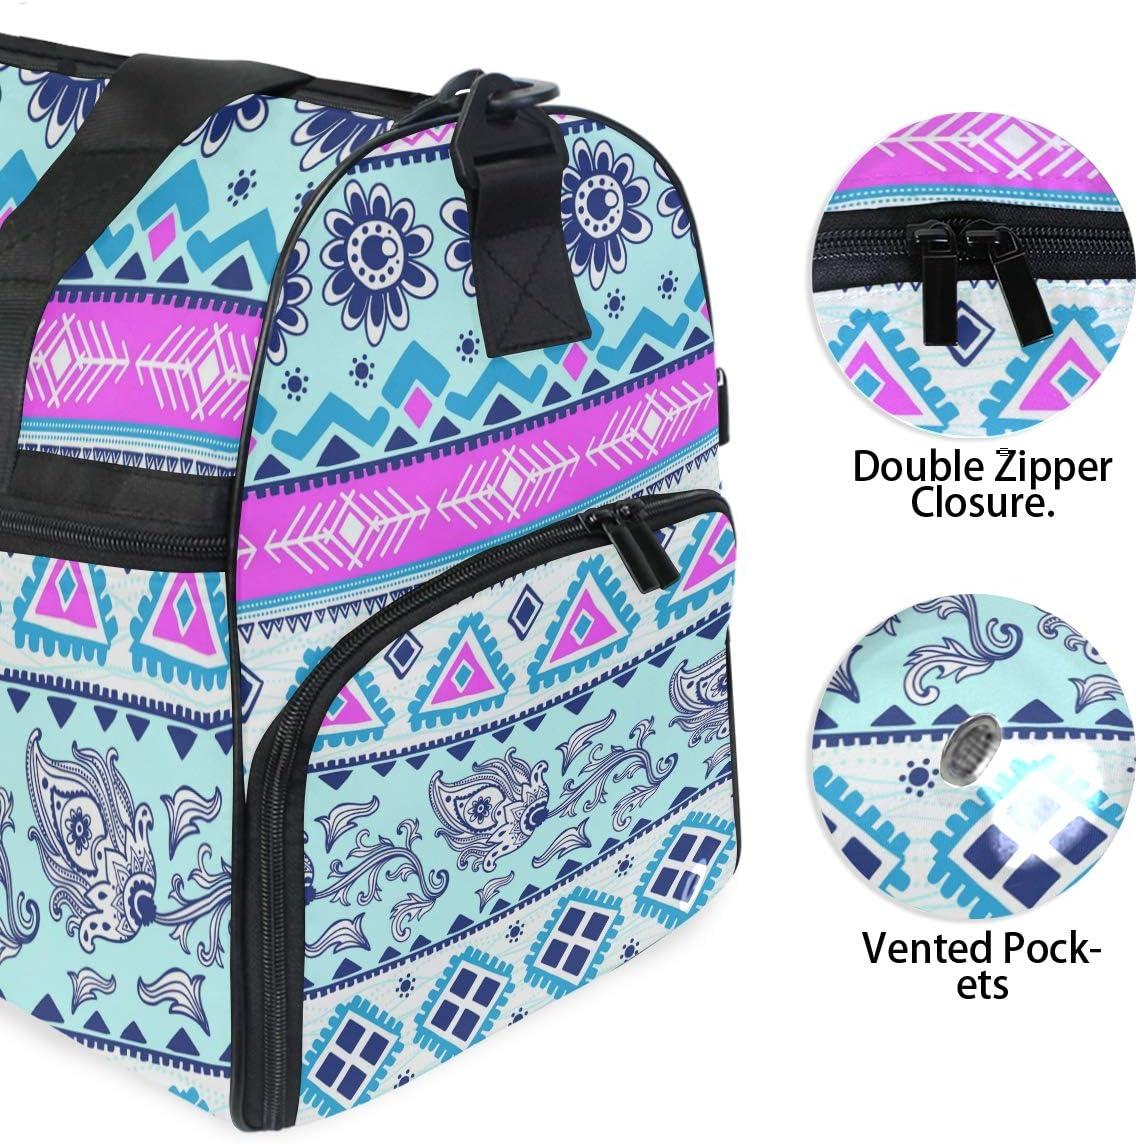 MALPLENA Bohemian Style Print Packable Duffle Bag For Men Women Tear Resistant Sports Duffle